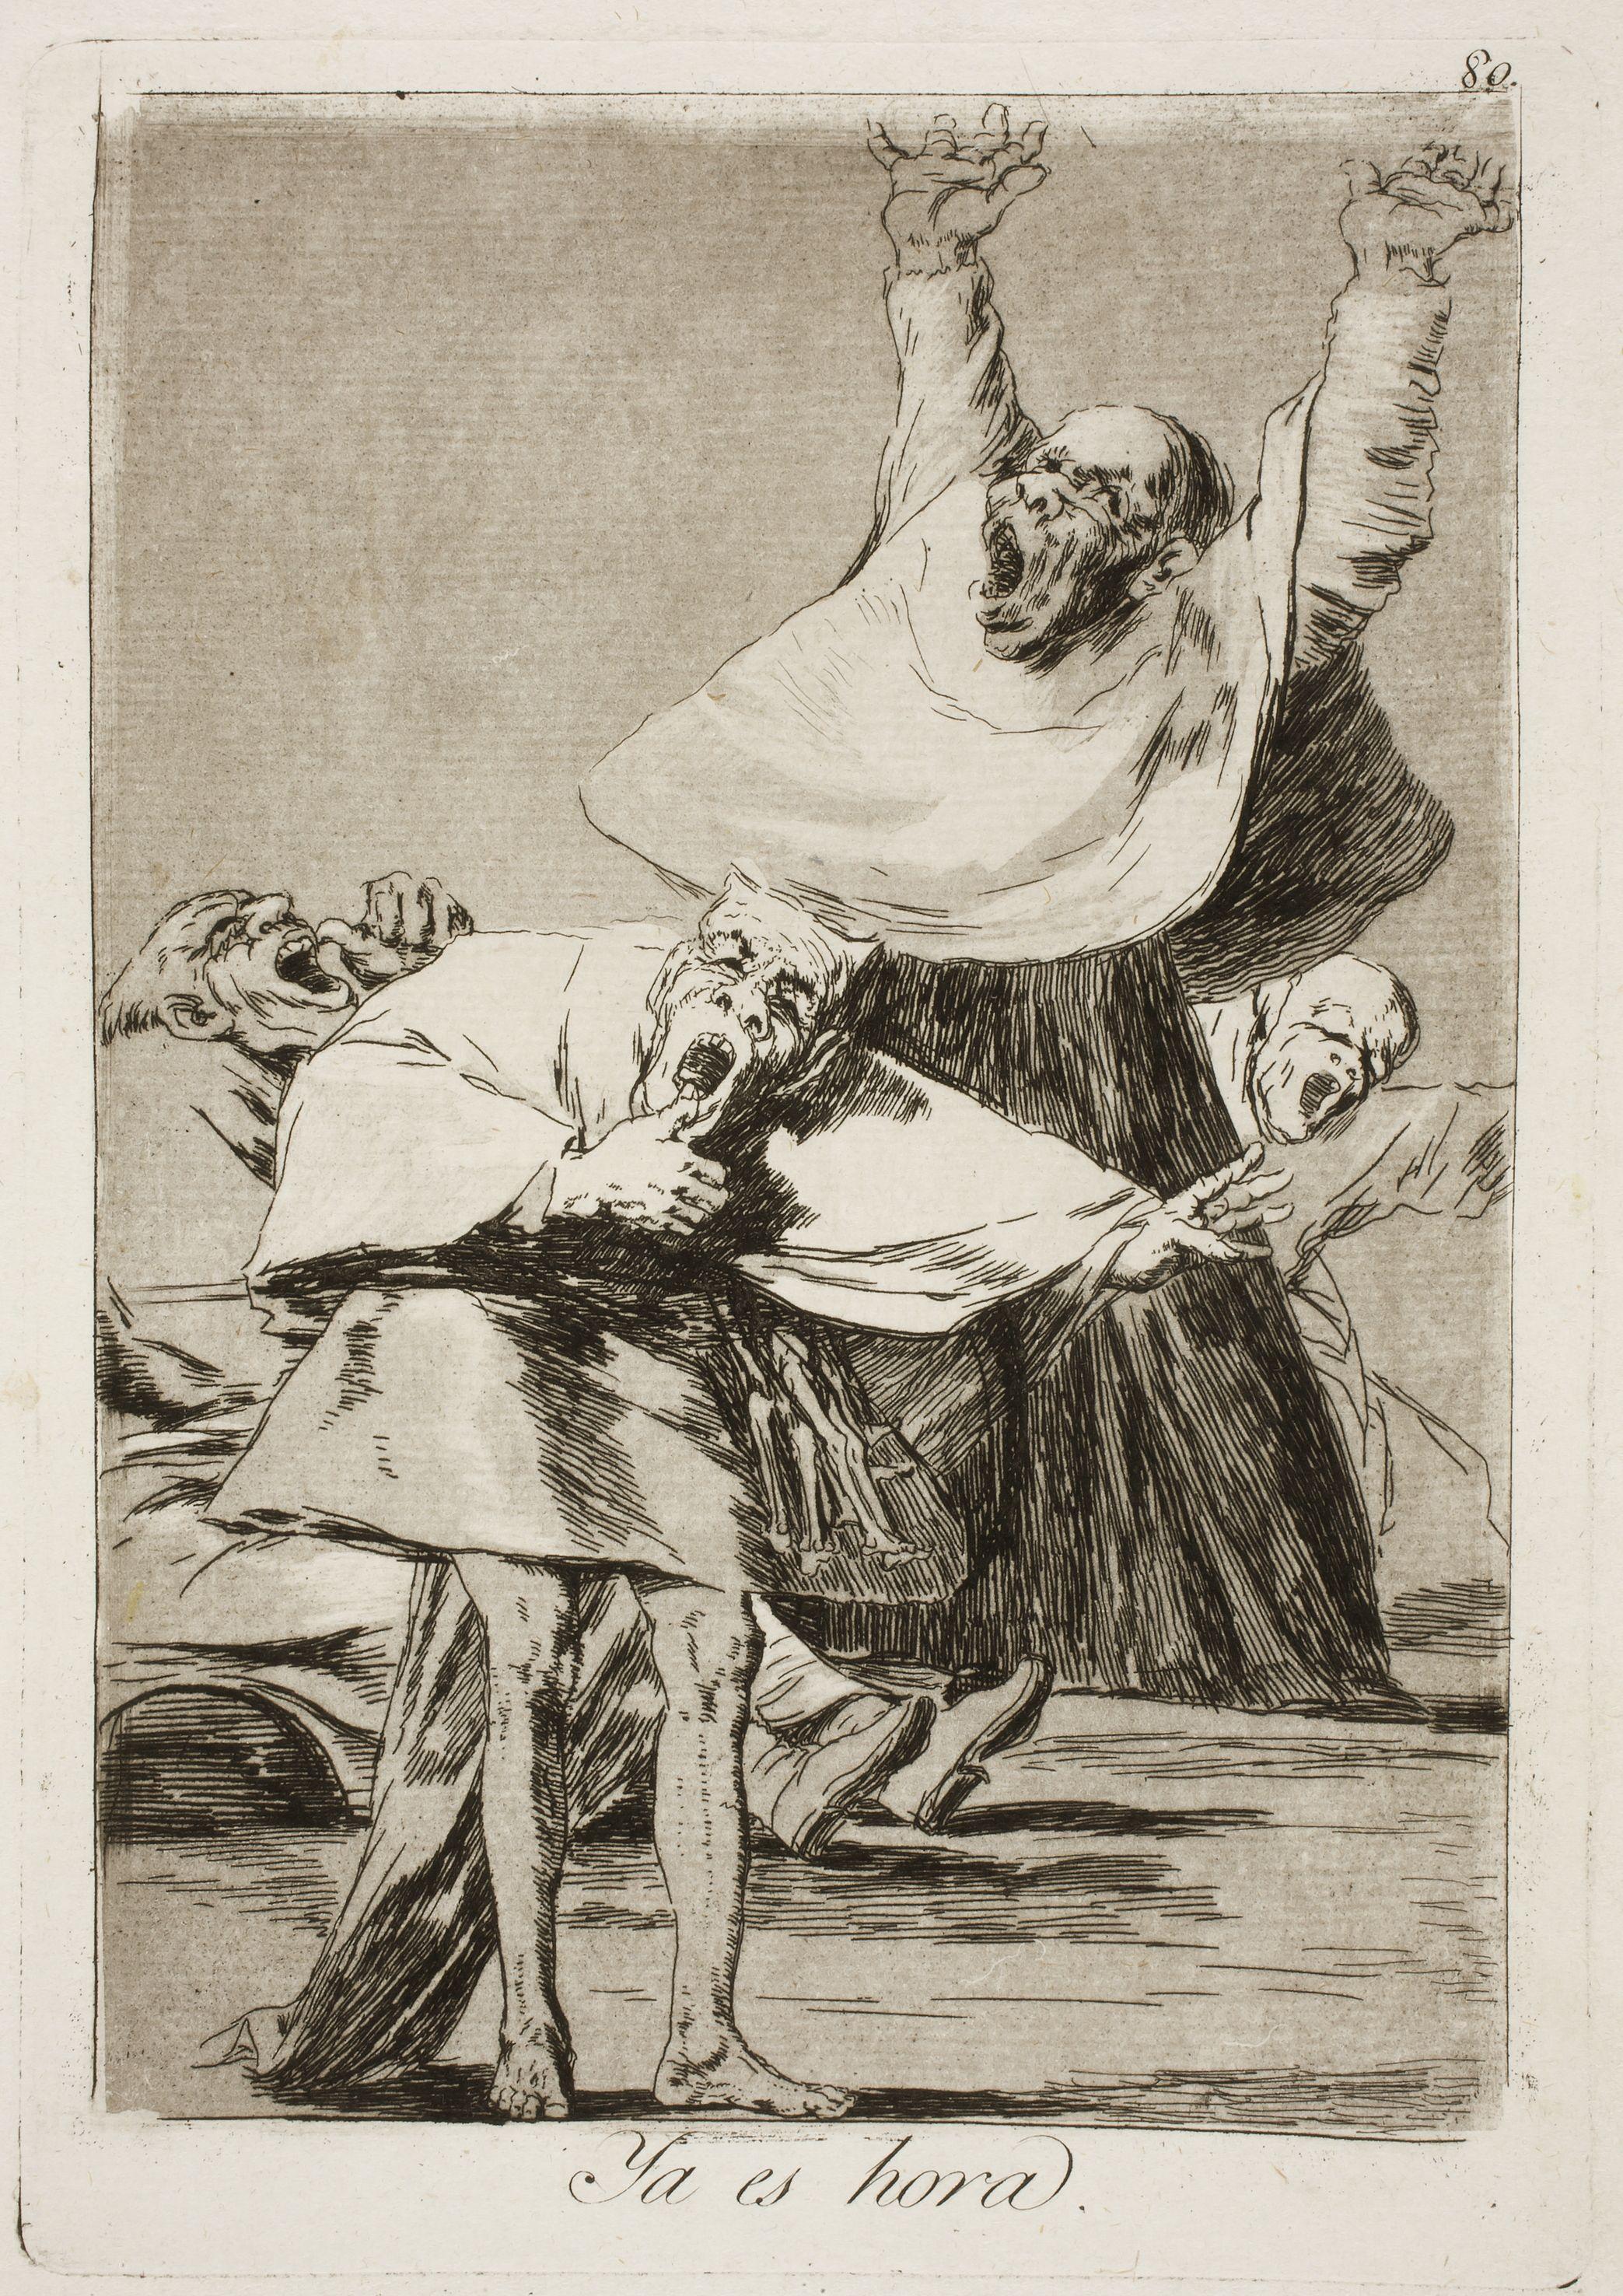 Pin on Francisco Goya